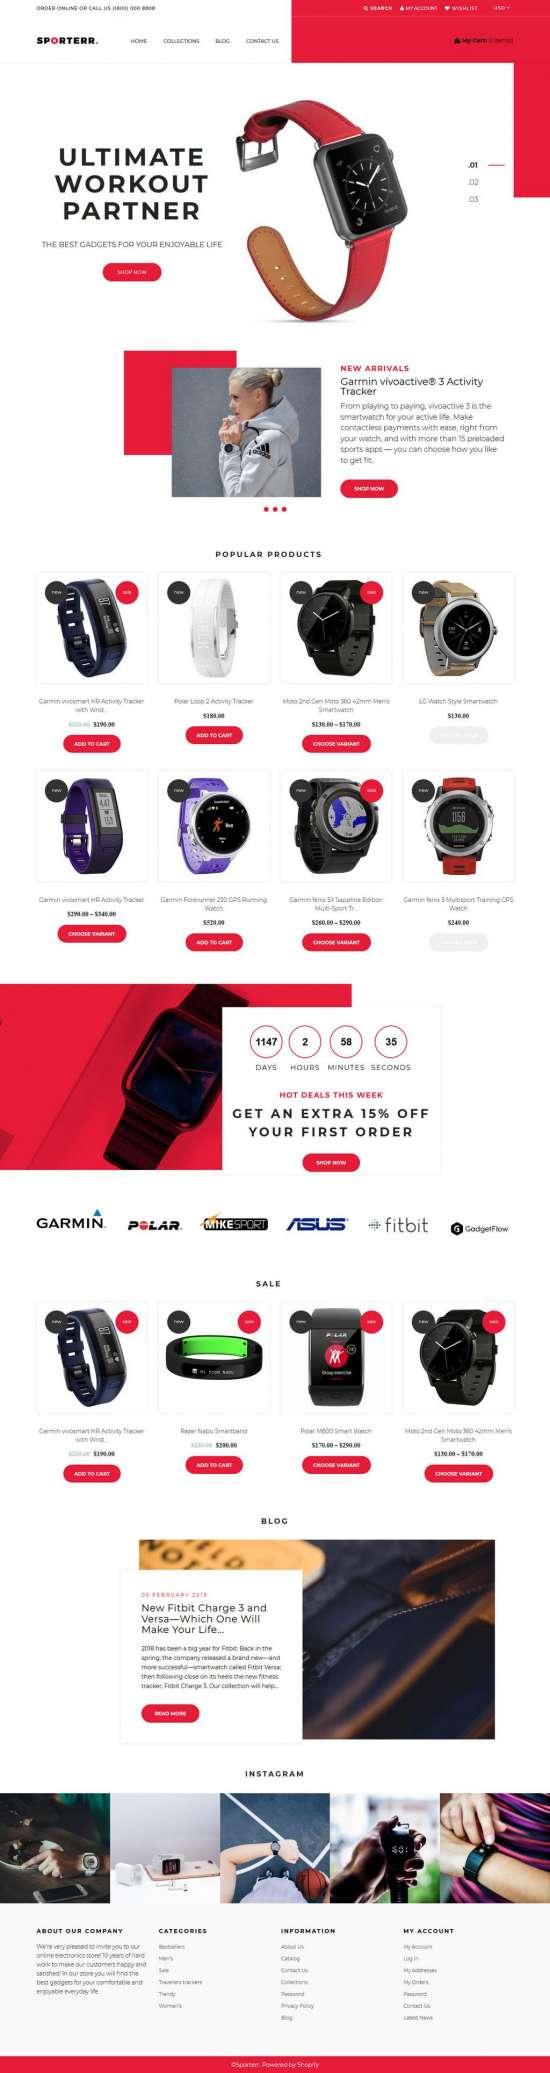 sporterr shopify theme 01 550x2073 - Sporterr Shopify Theme